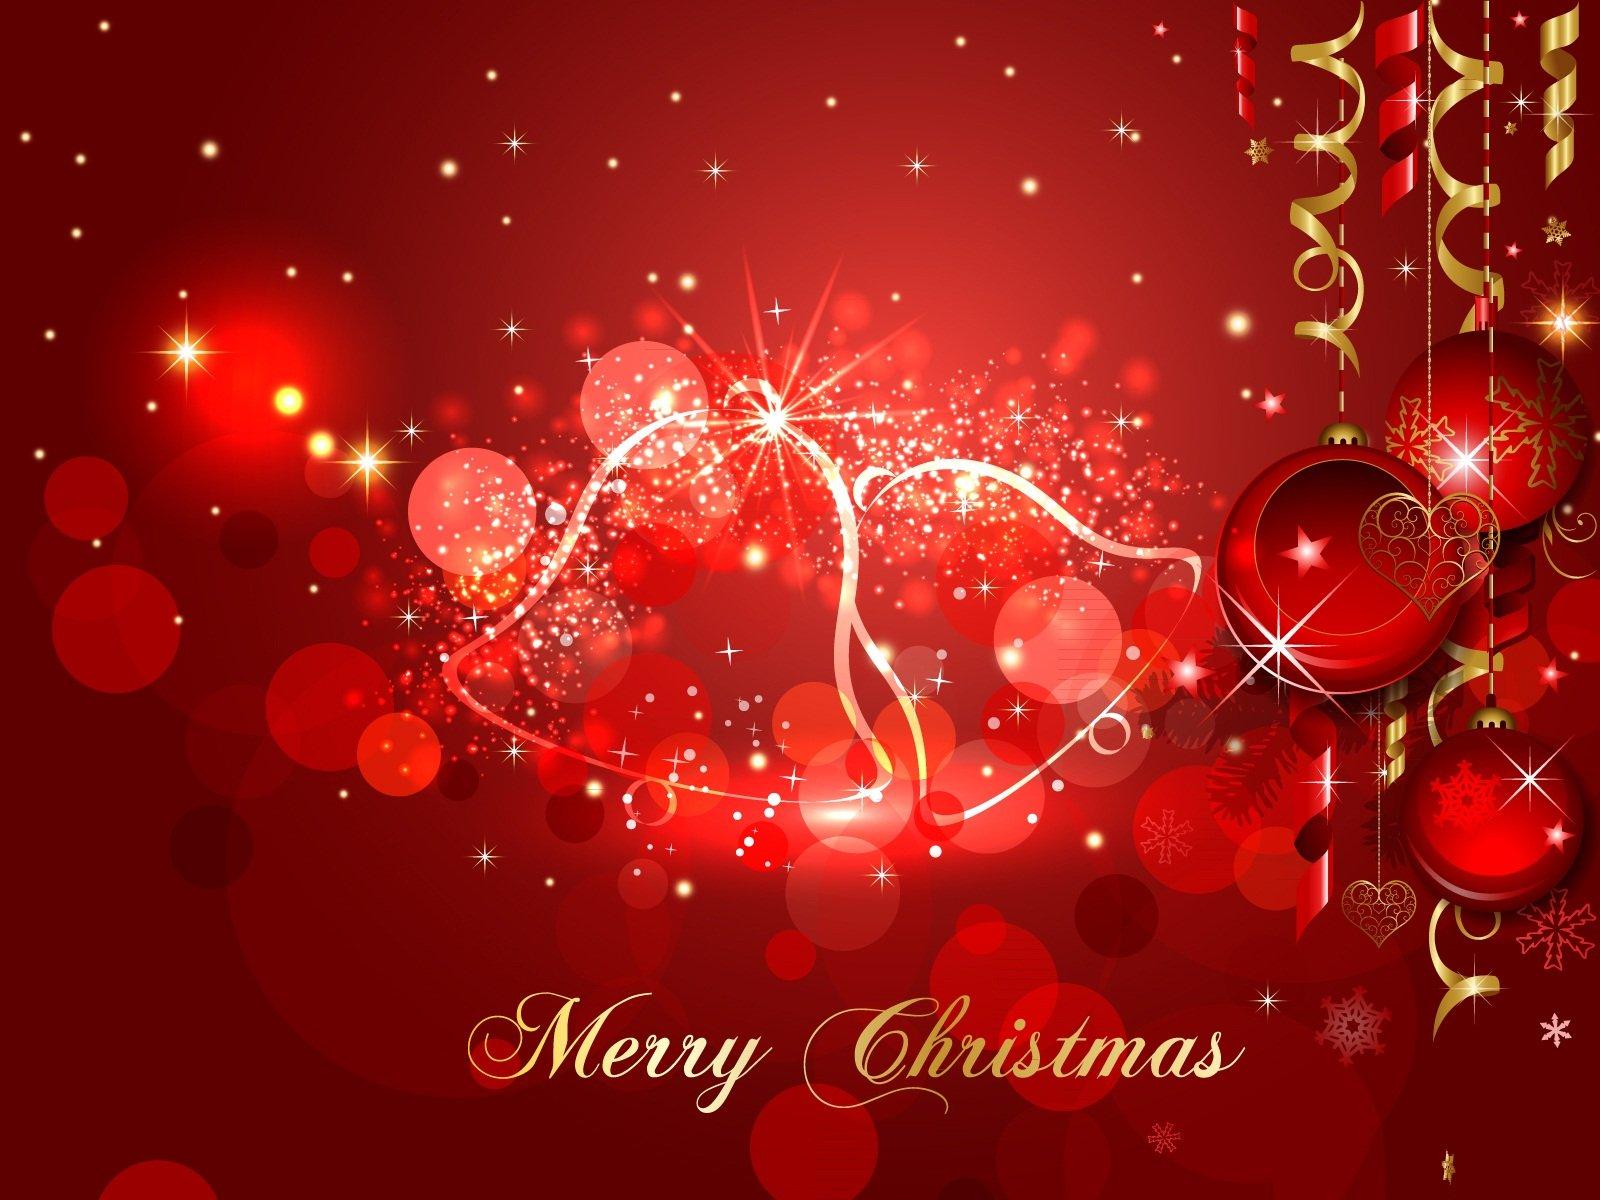 merry_christmas_2015